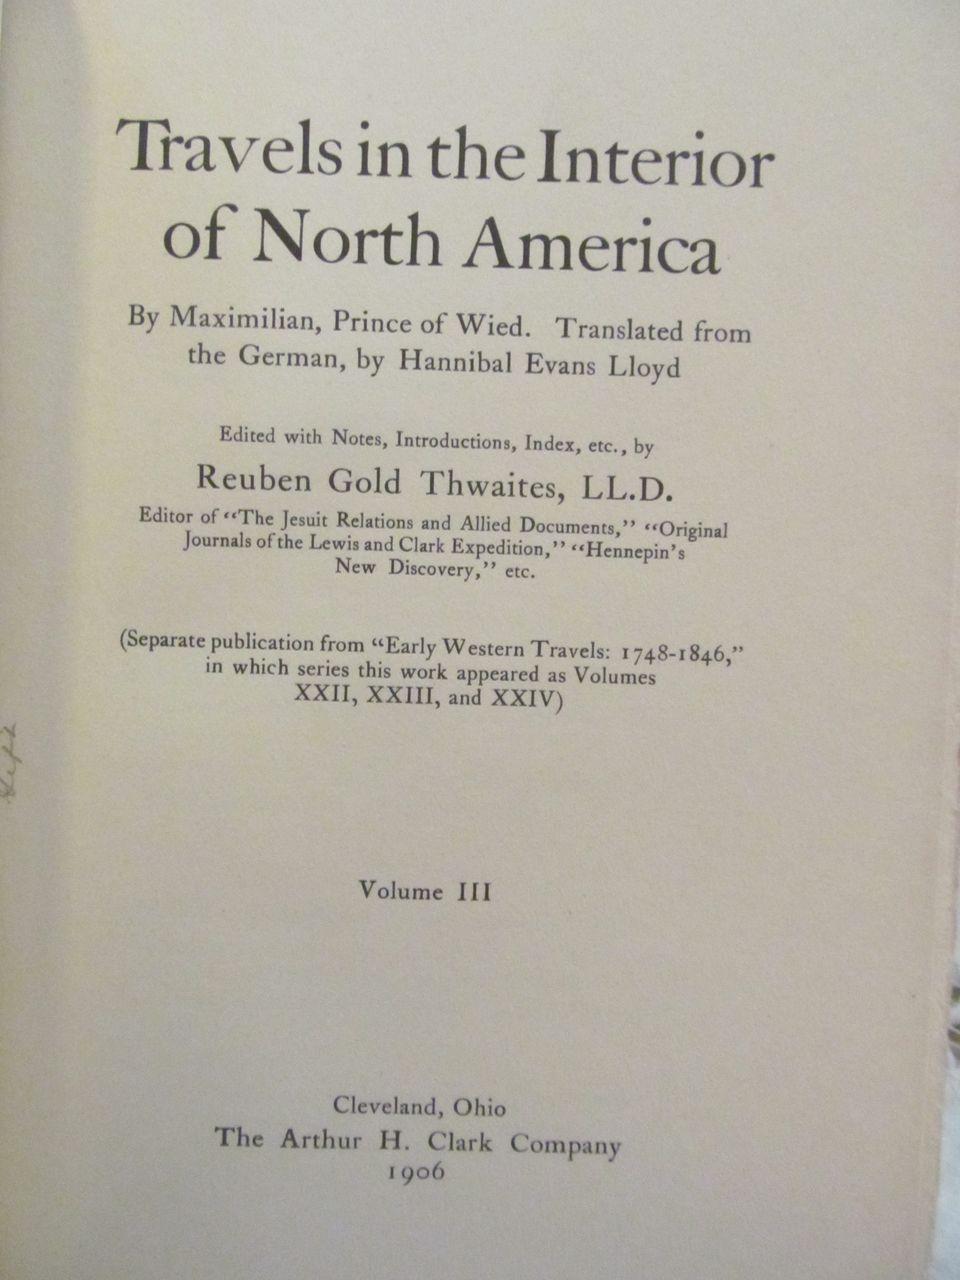 1906 Early Western Travels 1748-1846, Volume XXIV, Maximilian Part 3, Edited by Reuben Gold Thwaites, Publ The Arthur H Clark Company